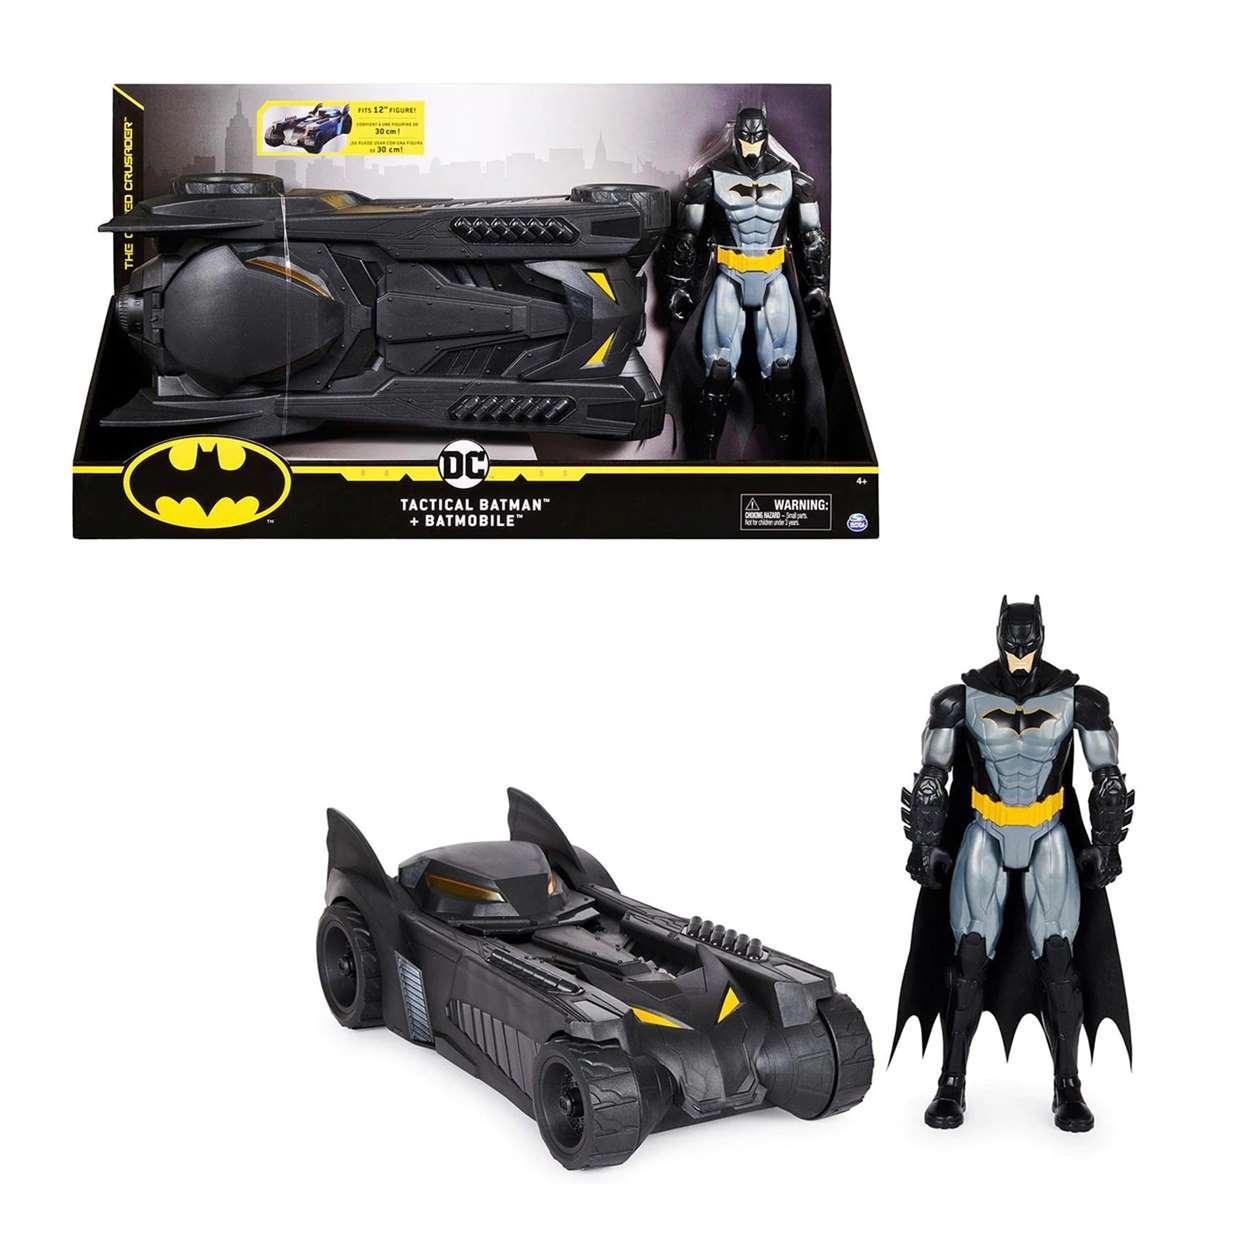 Pack Tactical Batman + Batmobile Figura The Caped Crusader